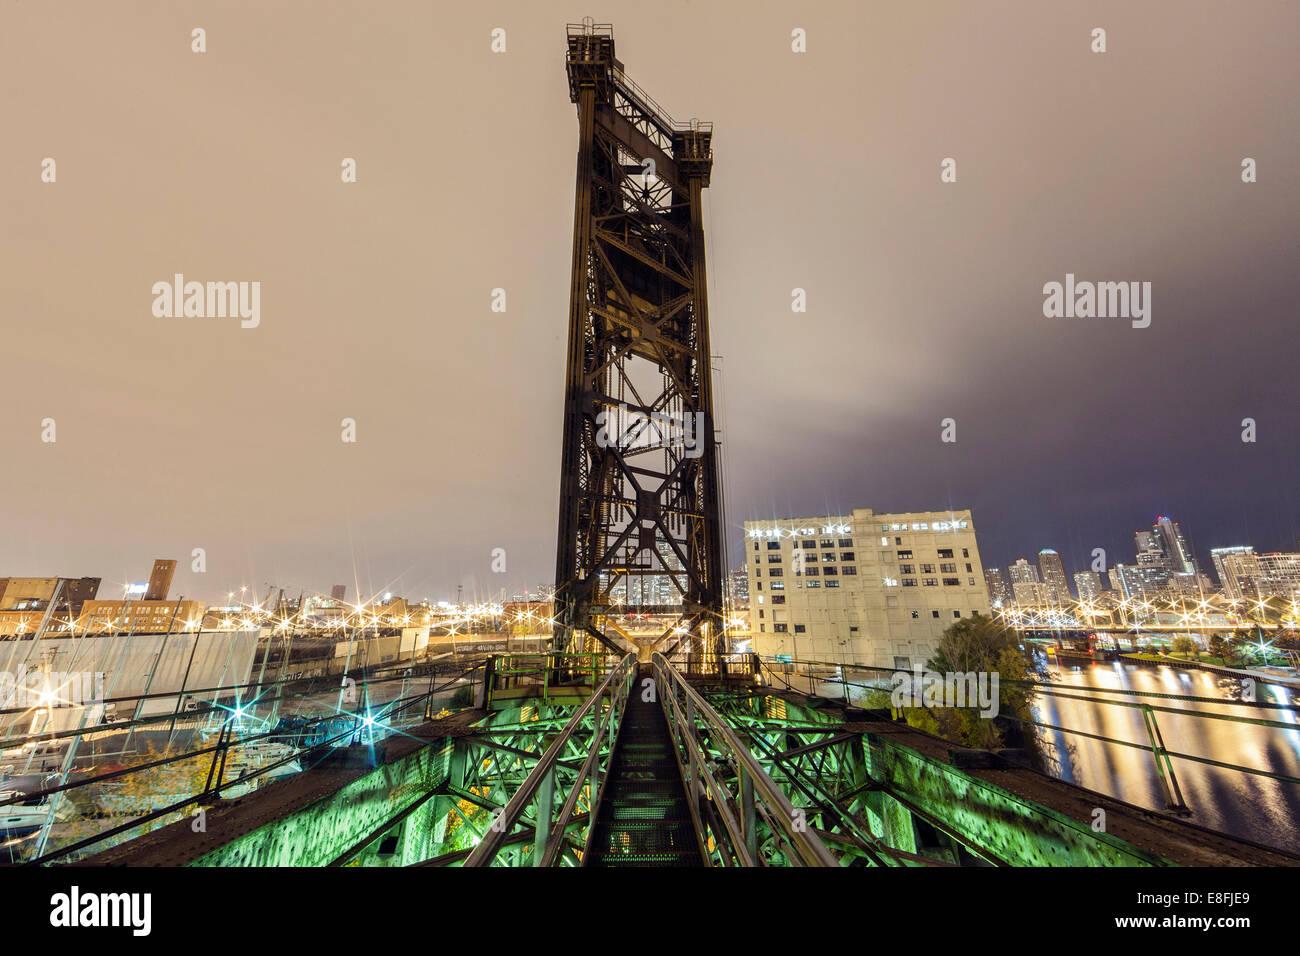 USA, Illinois, Cook County, Chicago, Chinatown Bridge - Stock Image